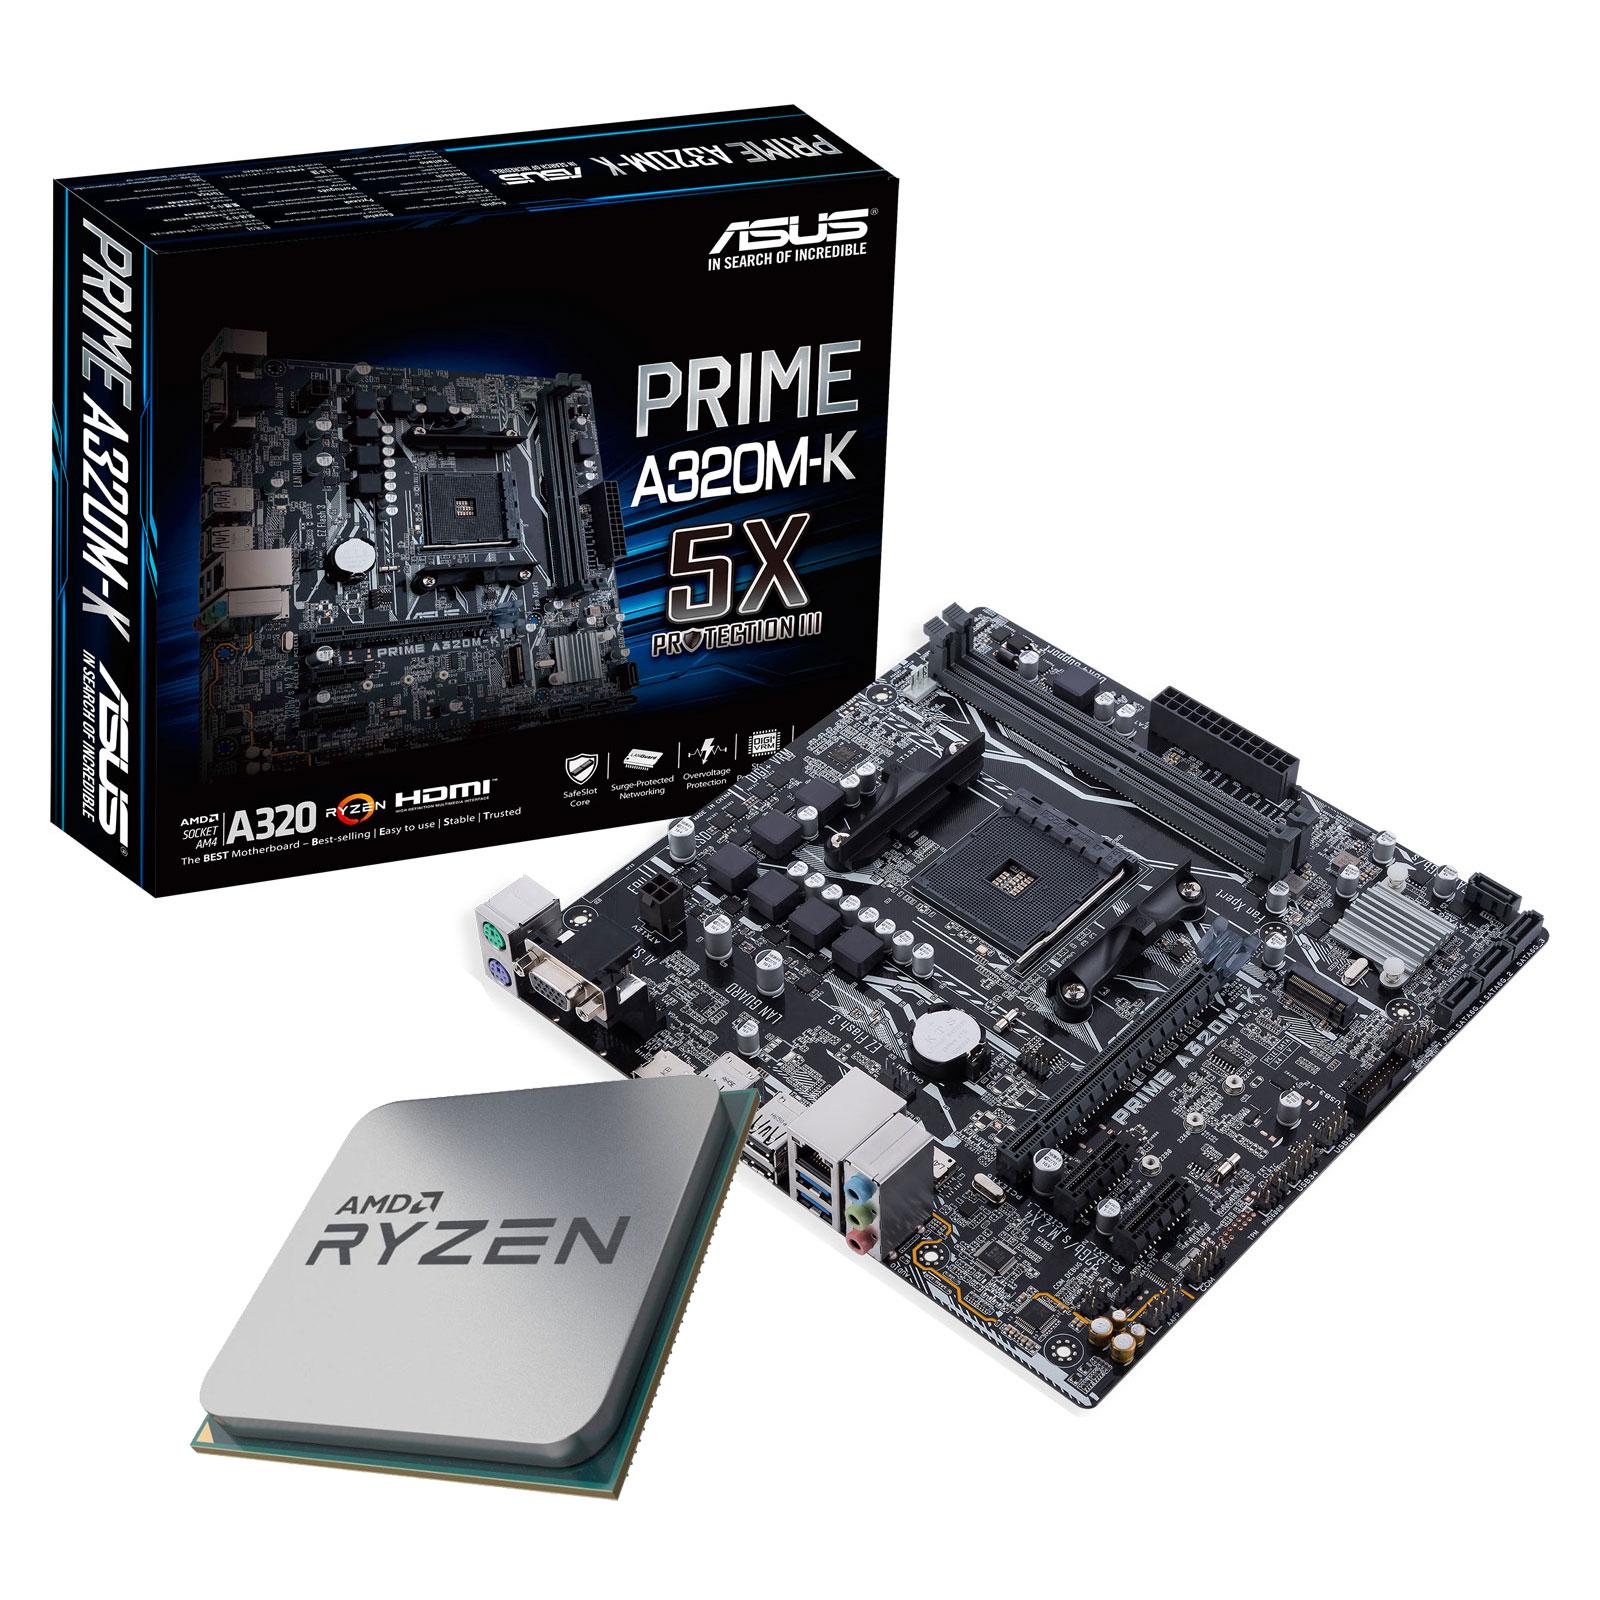 Kit upgrade PC Kit Upgrade PC AMD Ryzen 5 2400G ASUS PRIME A320M-K Carte mère Micro ATX Socket AM4 AMD A320 + CPU AMD Ryzen 5 2400G (3.6 GHz)